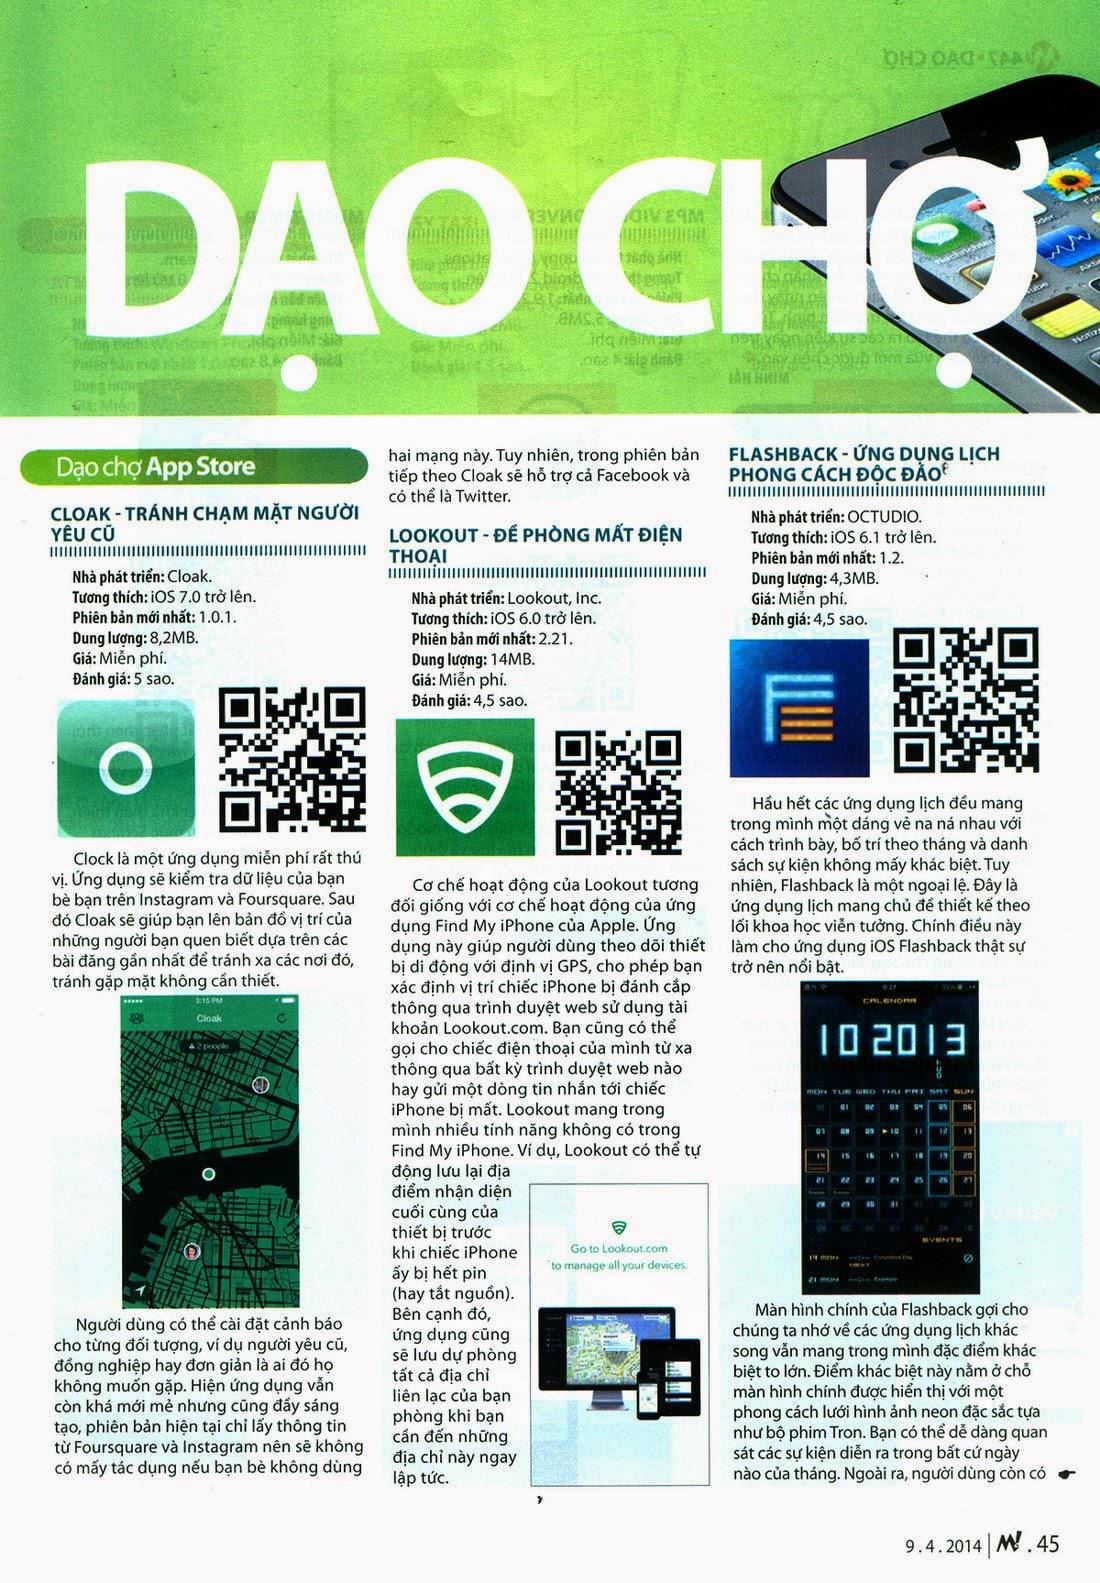 EChip Mobile – 447 - tapchicntt.com